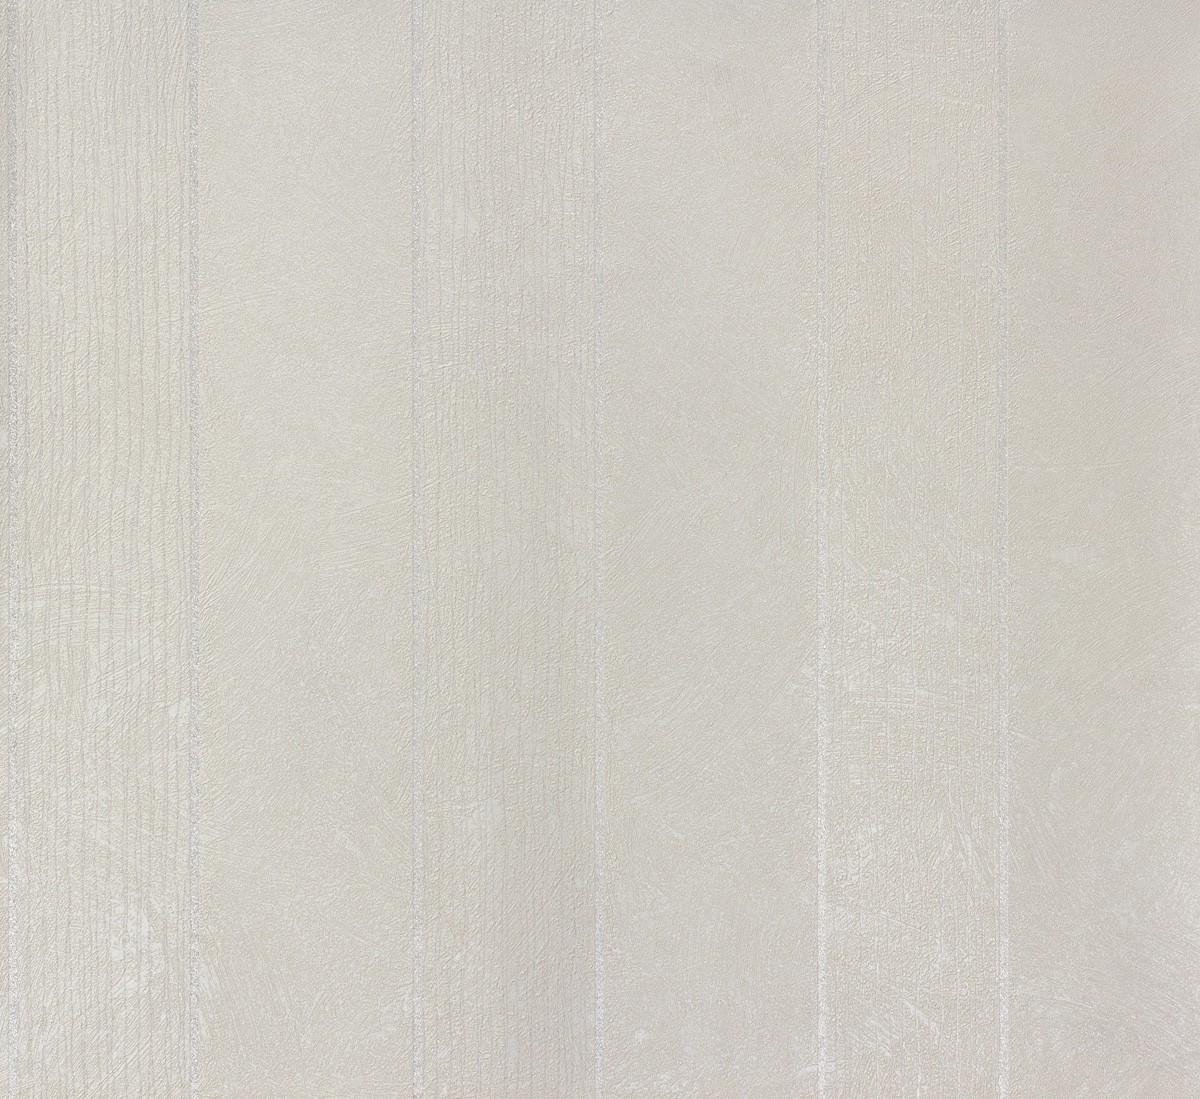 Tapete vlies streifen silber creme 56852 for Tapete silber